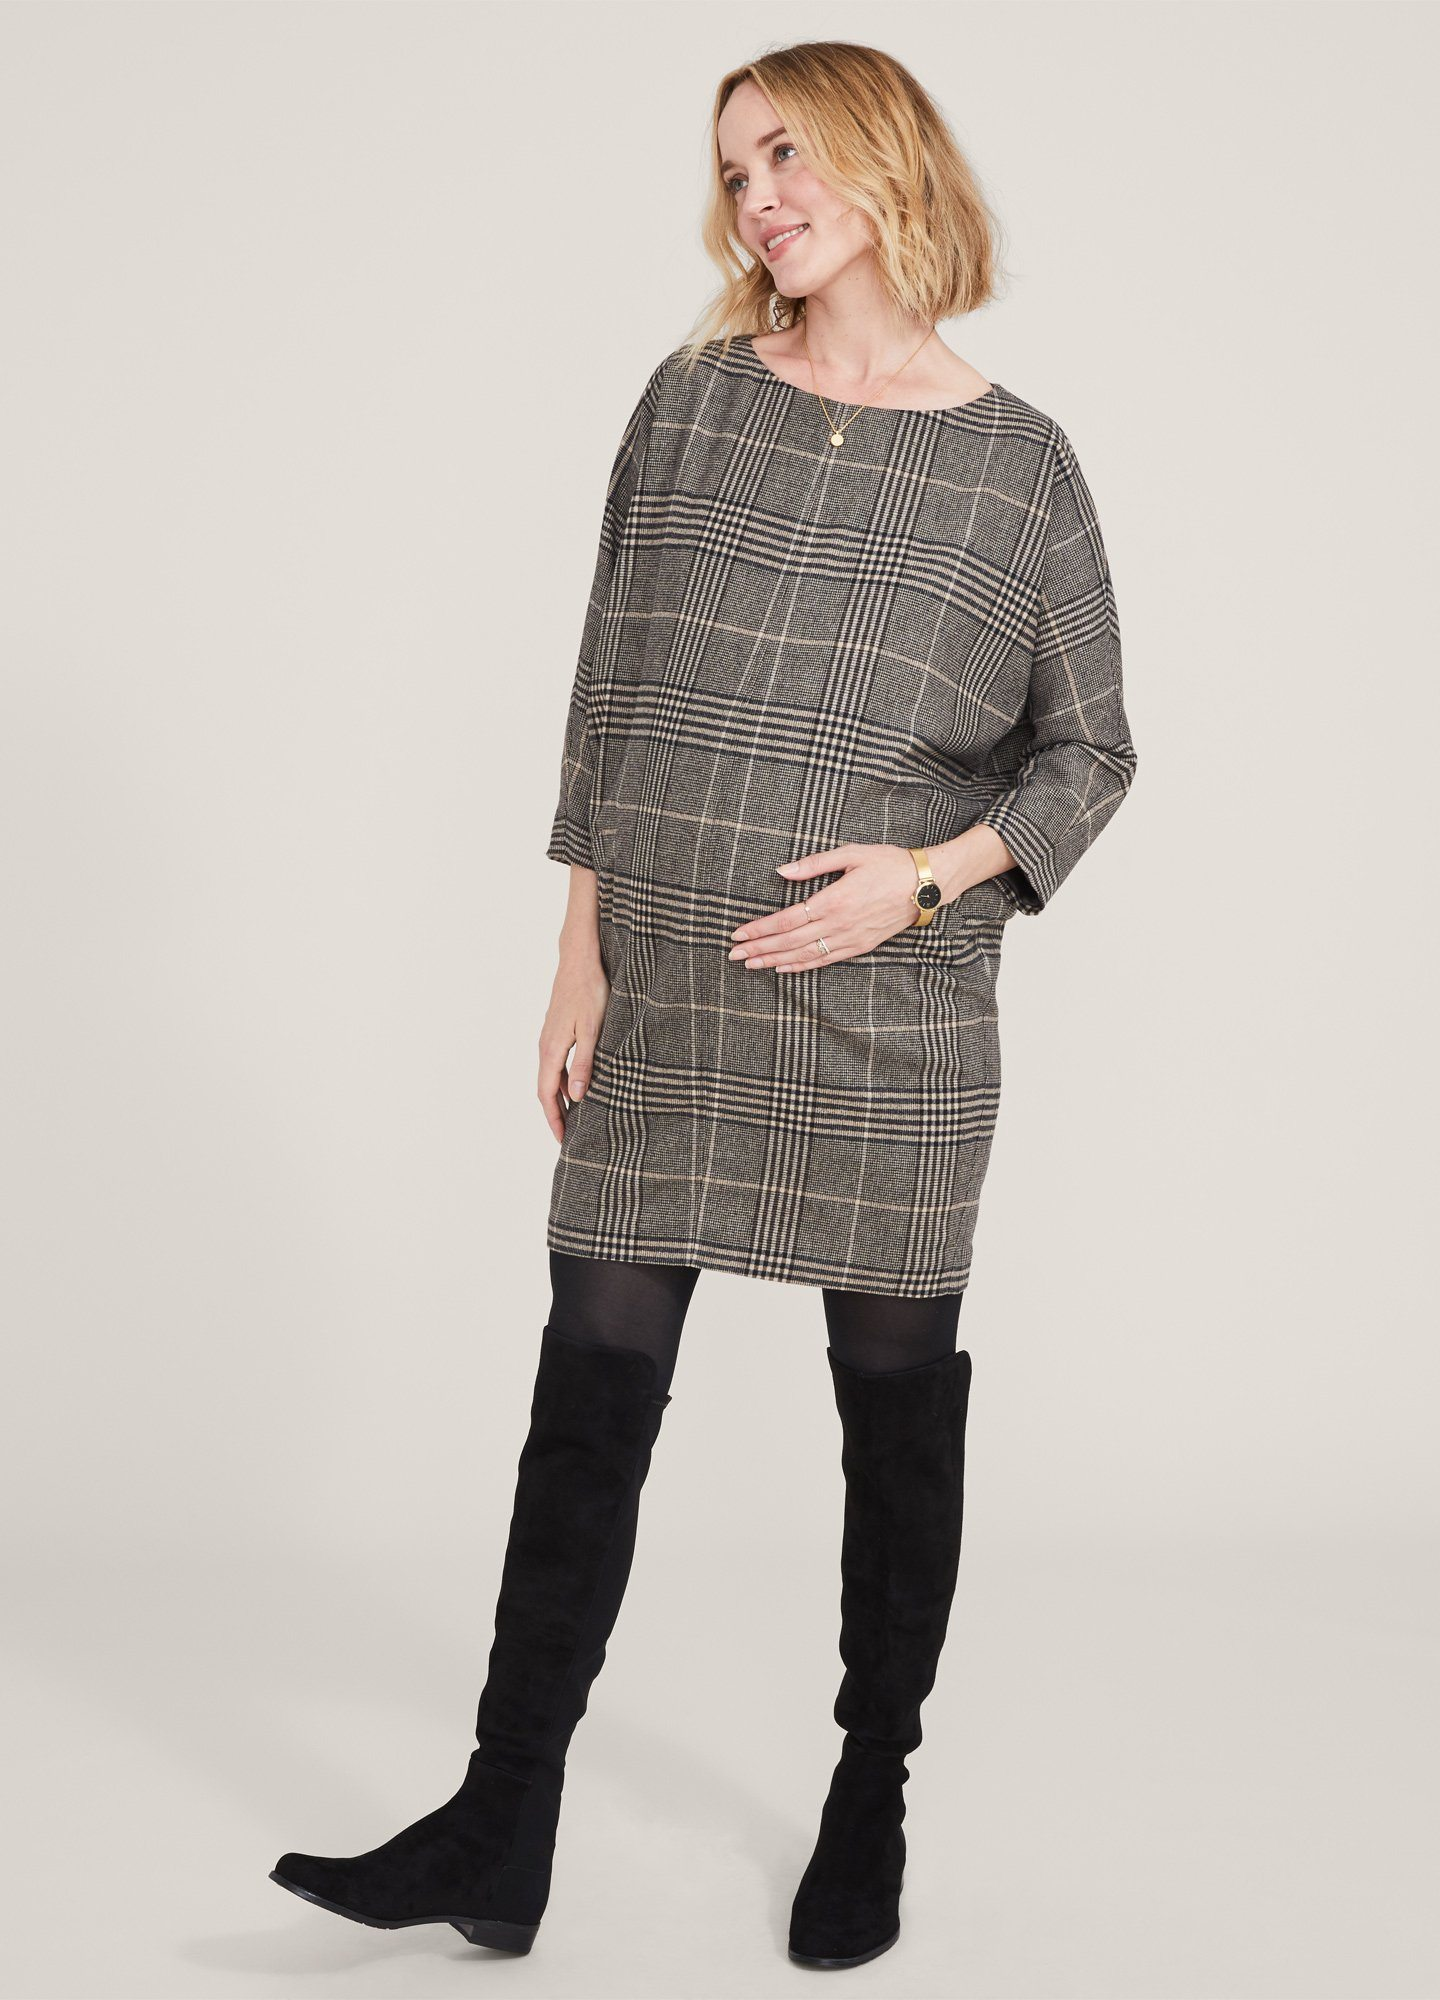 HATCH Maternity The Pauline Dress, camel Plaid, Size 3